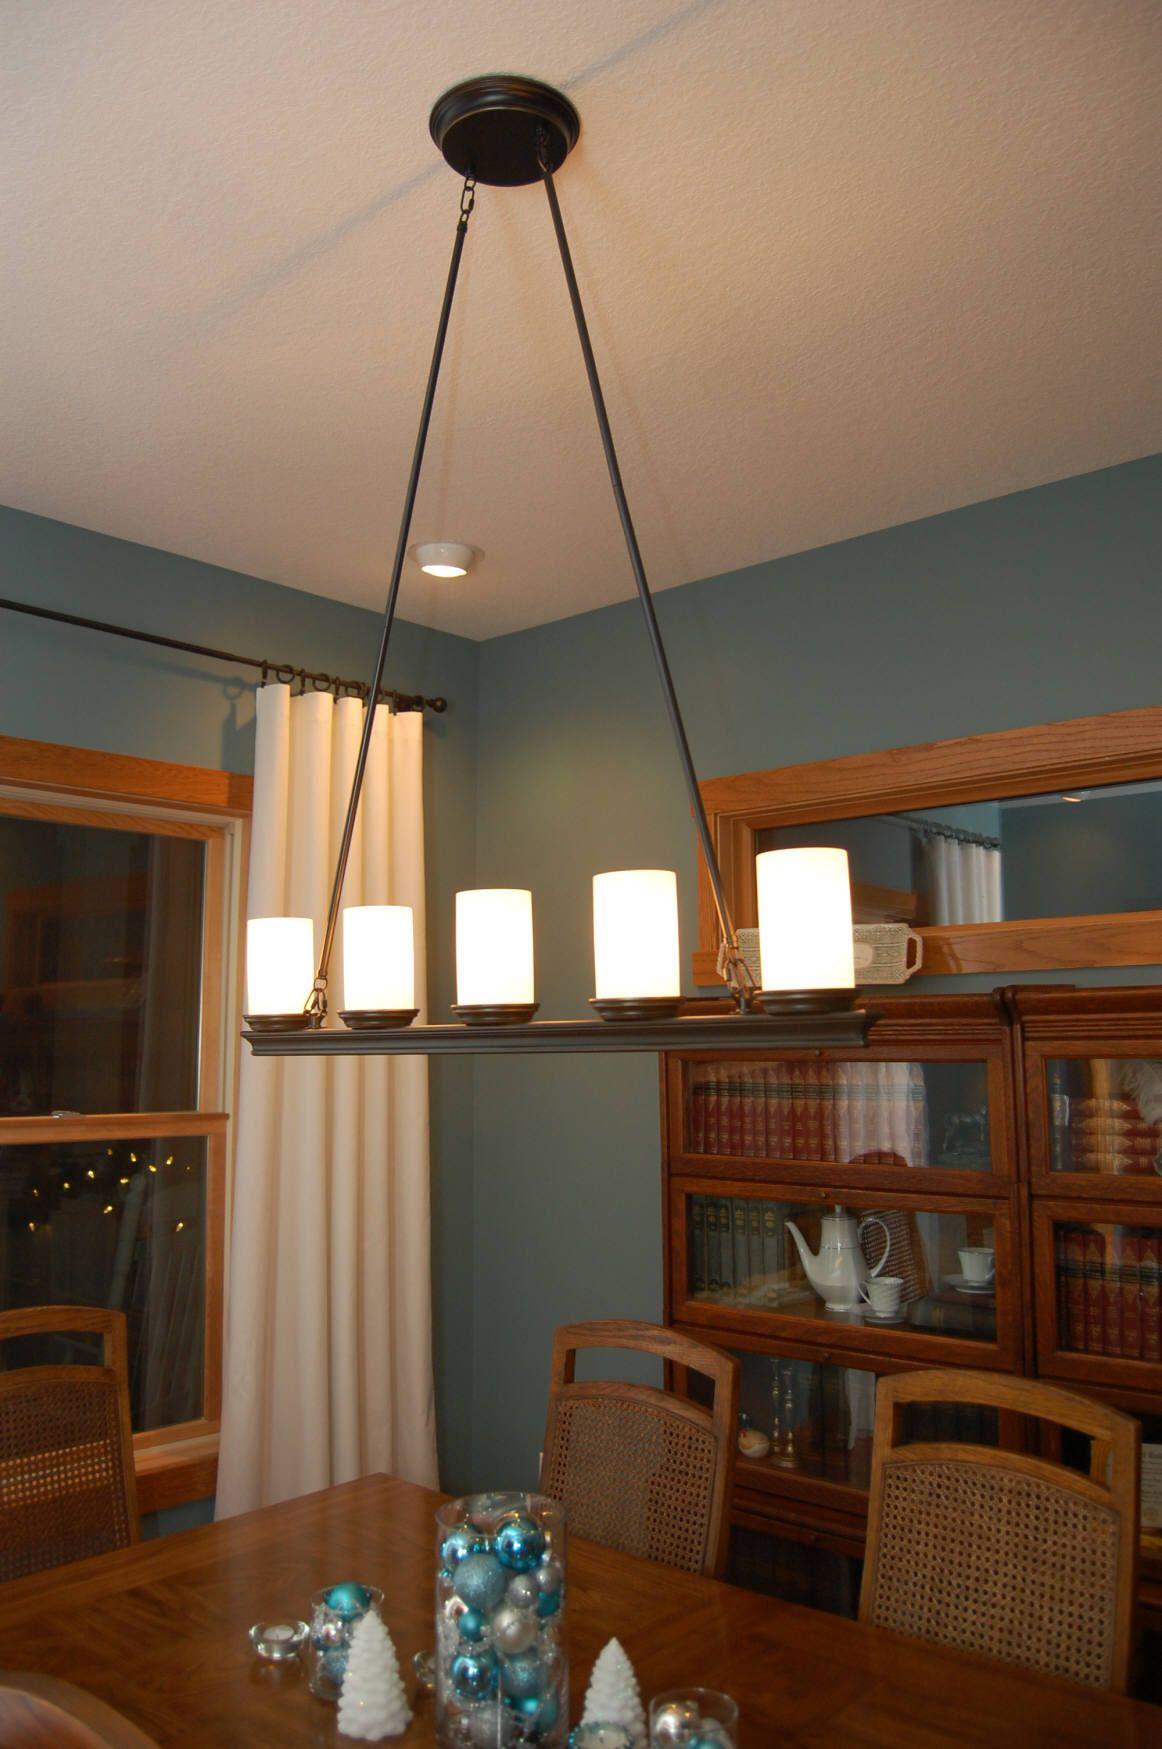 Impressive Line Candle Chandelier As Dining Room Lights Uk Above Light Brown Hardwood Table With Blue Jar Decoration Magnificent